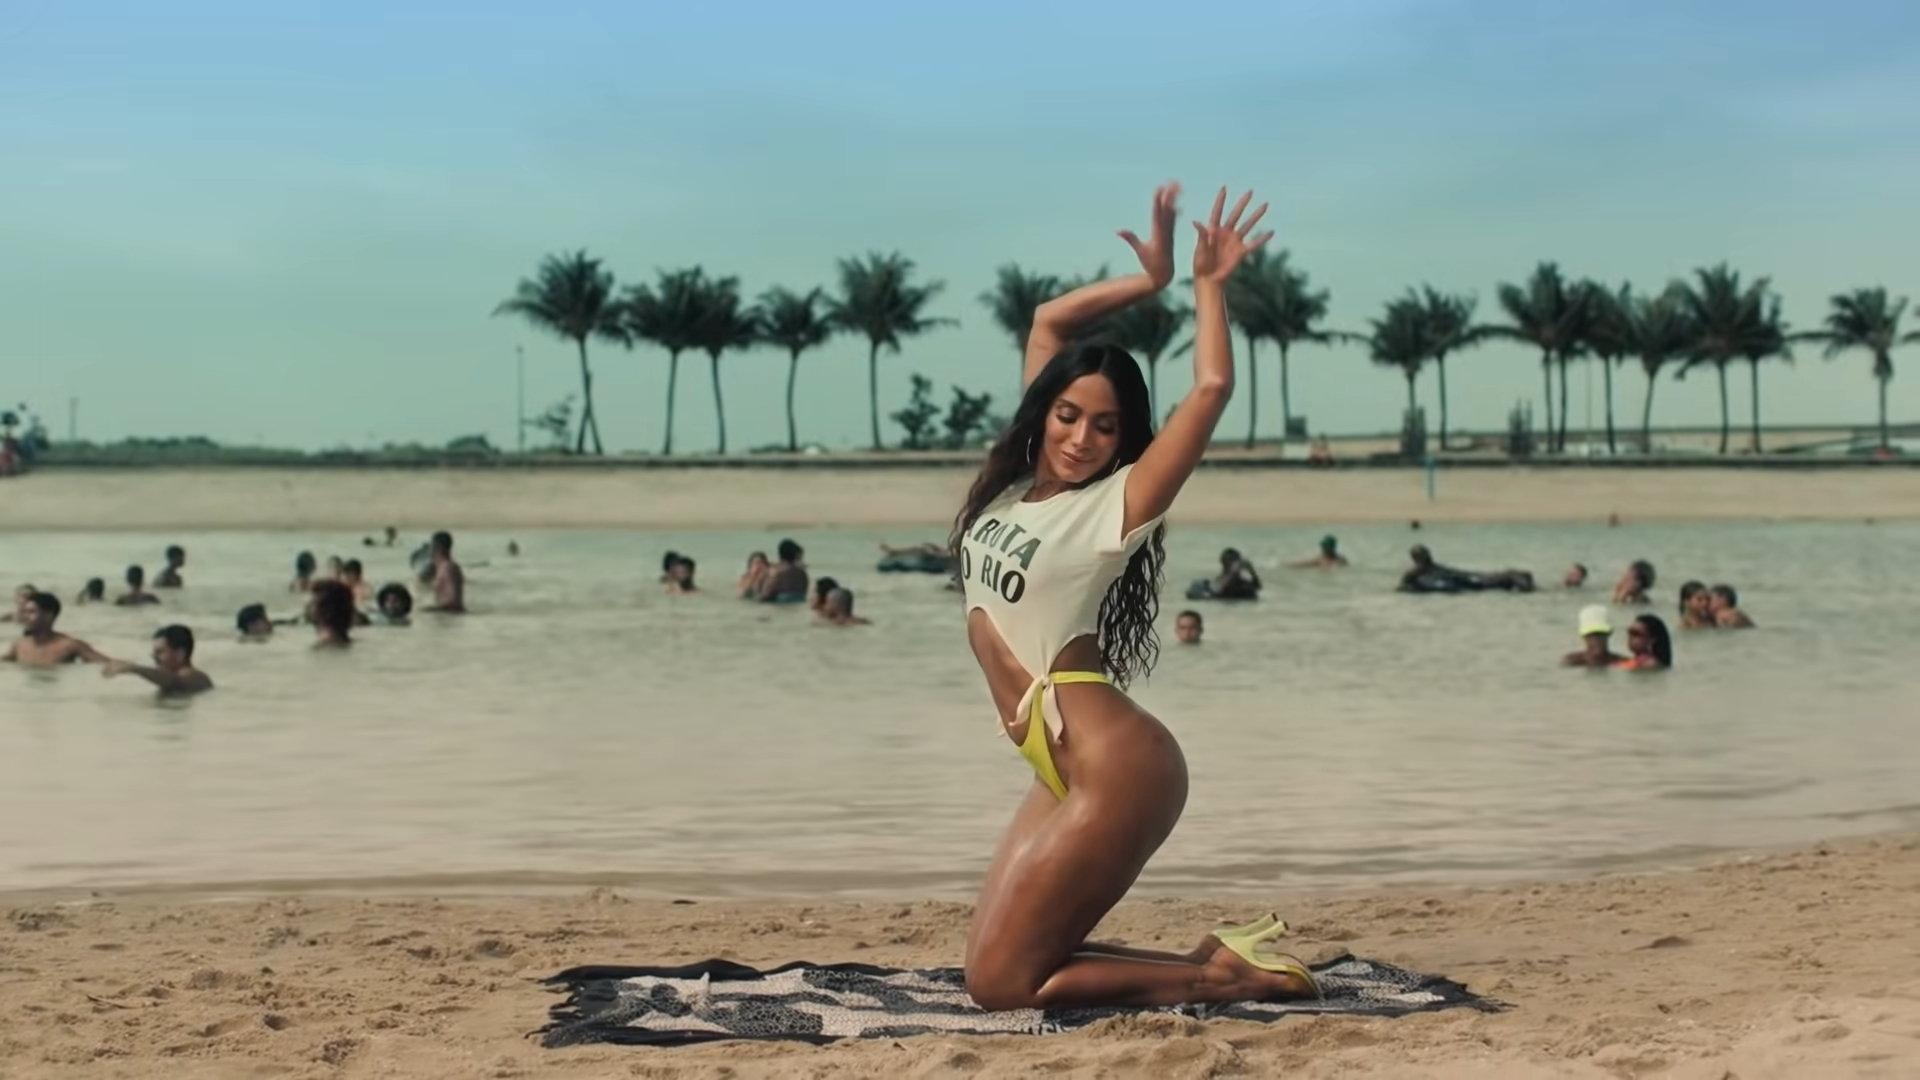 Anitta - Girl From Rio (Official Music Video) 2-37 Screenshot